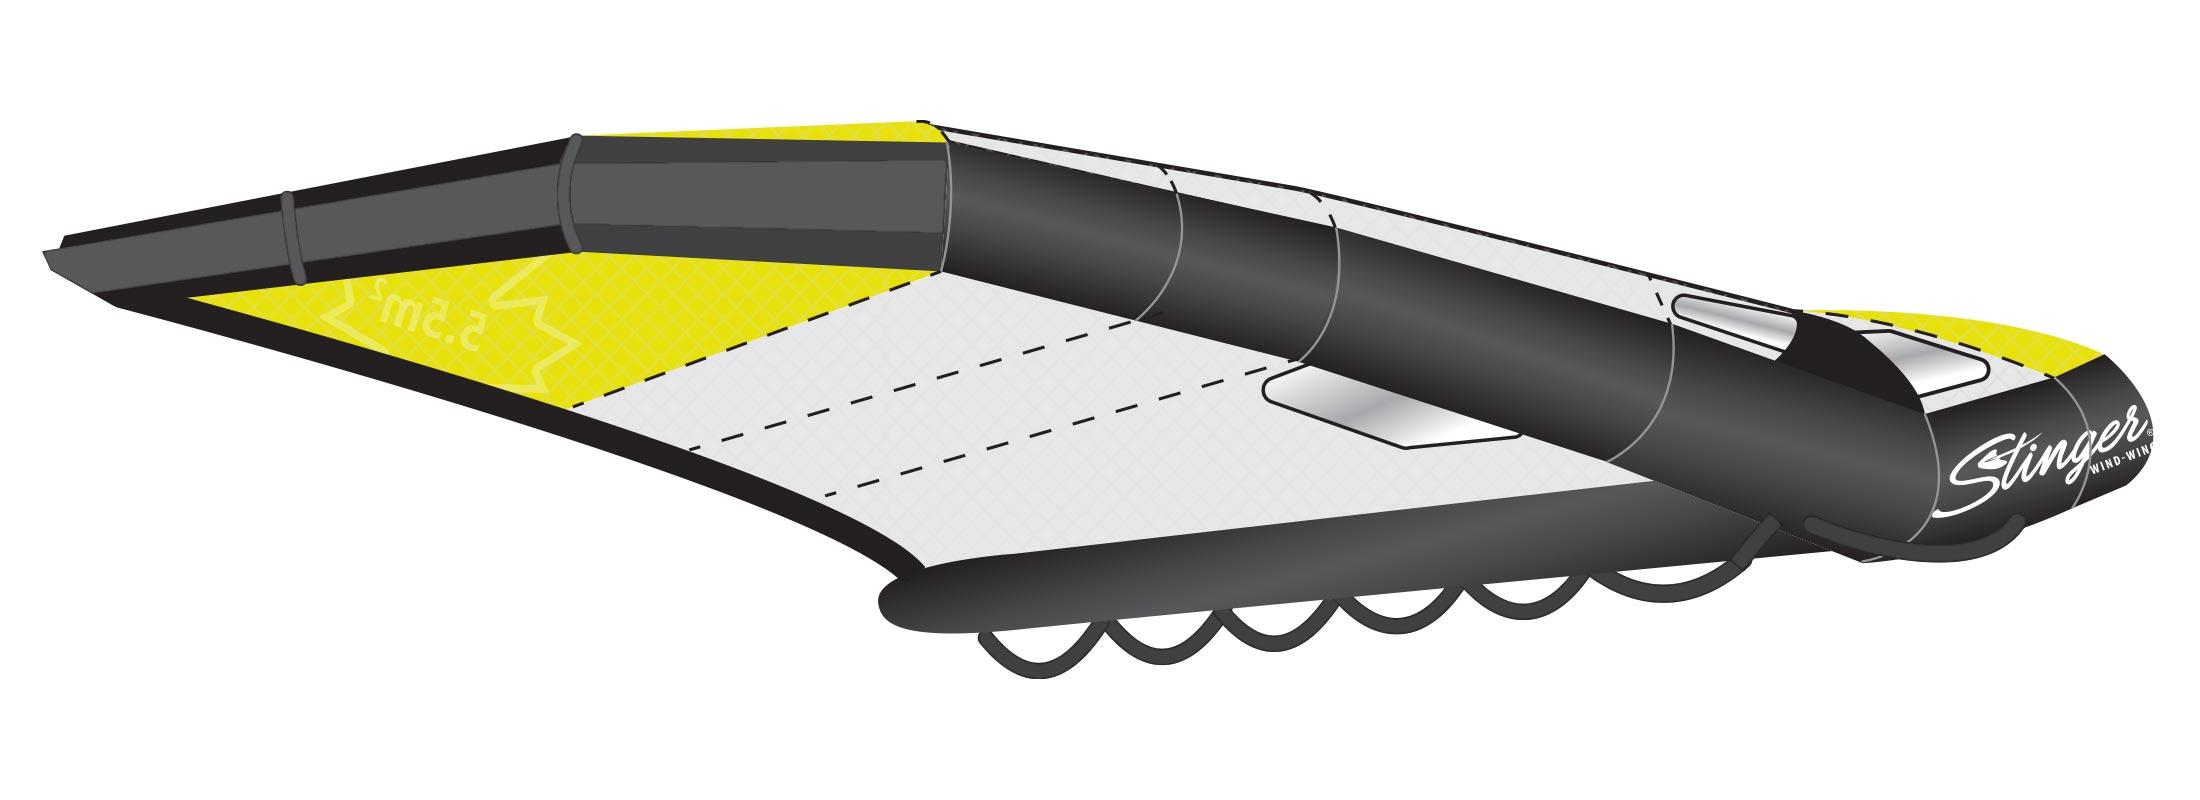 Stinger Wind Wing 3.1 Profile